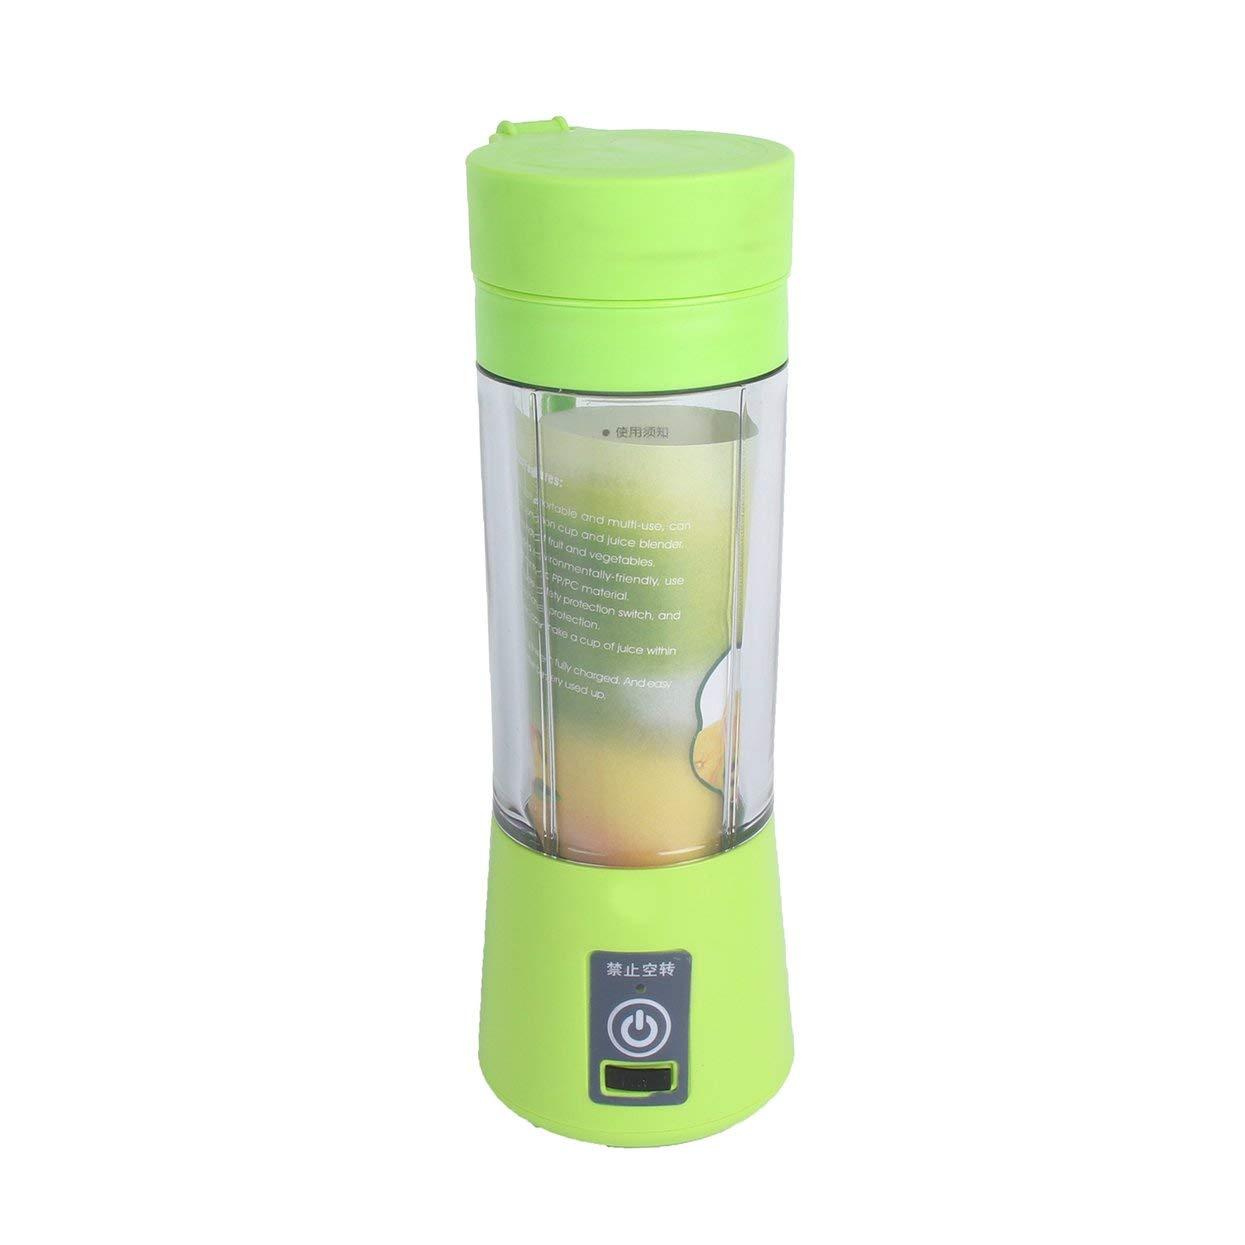 Tree-on-Life 2//4 Lames Mini USB Rechargeable Portable /électrique Fruits Juicer Smoothie Maker Blender Machine Sports Bouteille Juicing Tasse